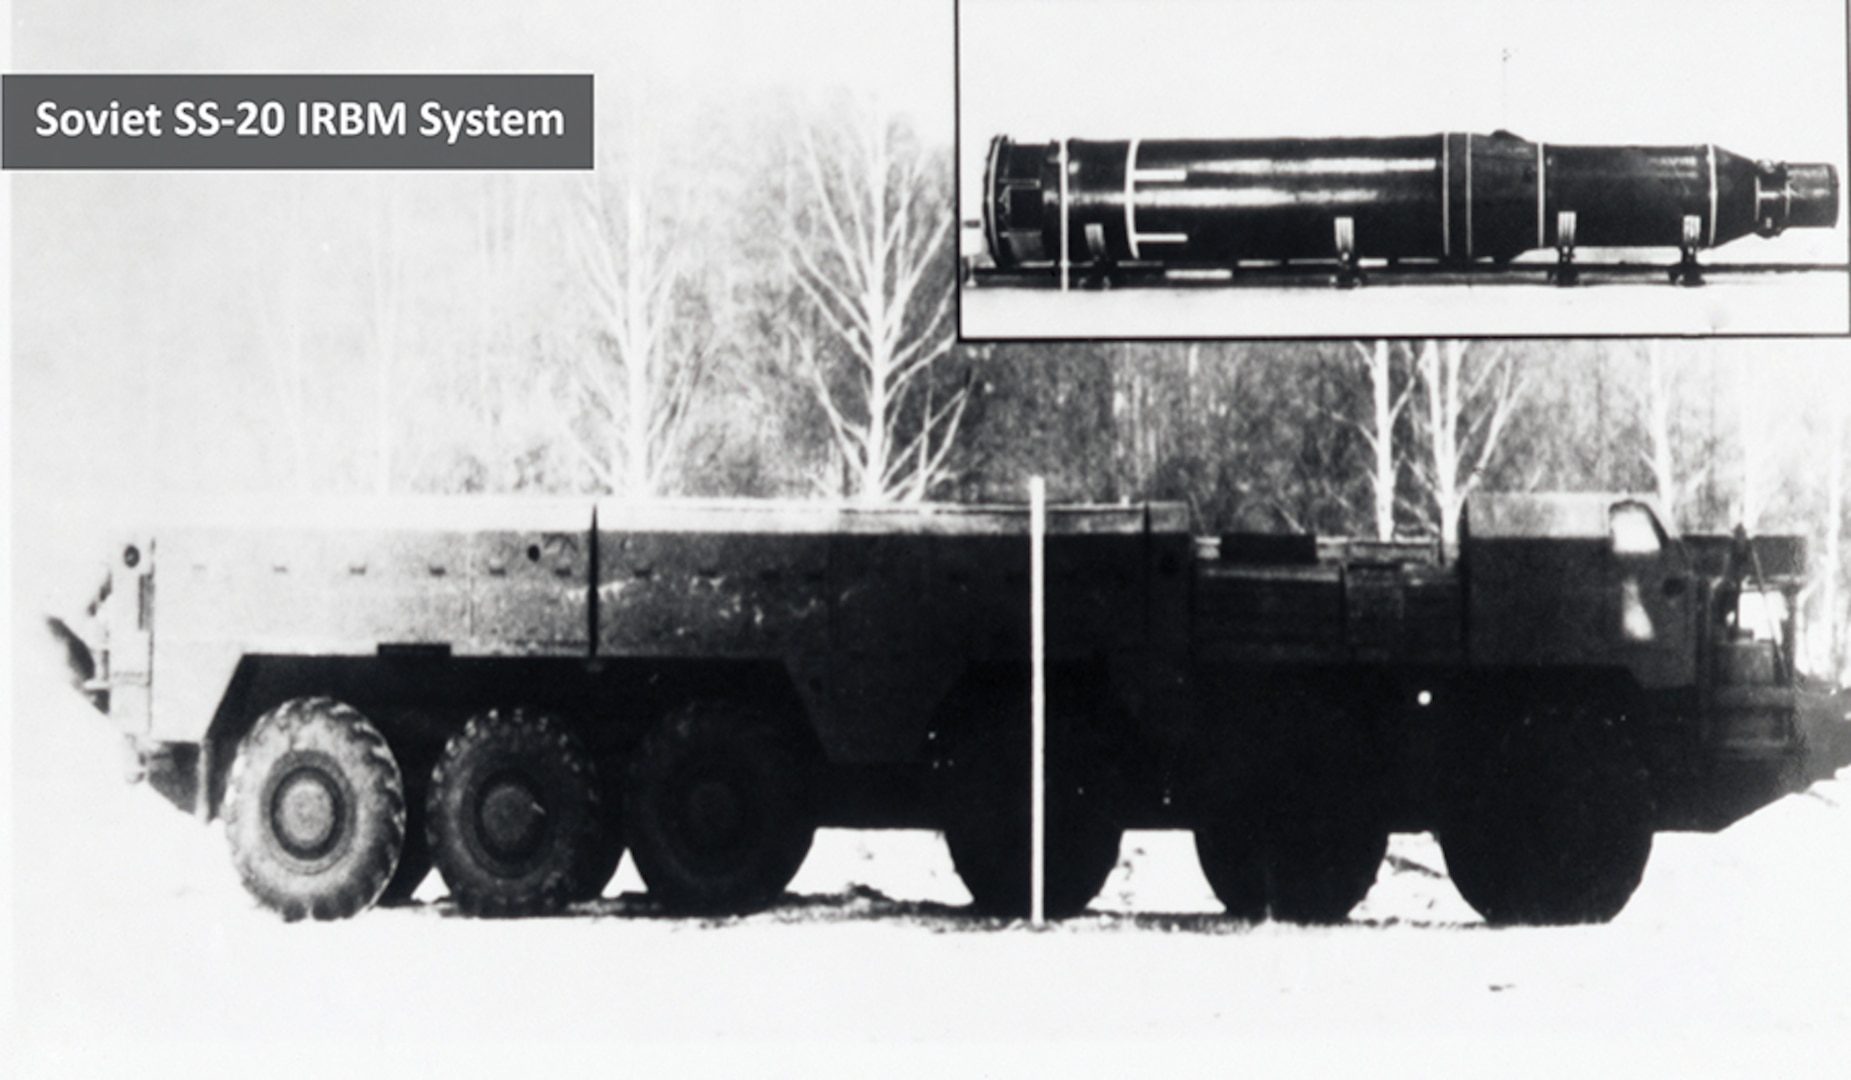 Soviet SS-20 Mobile Missile